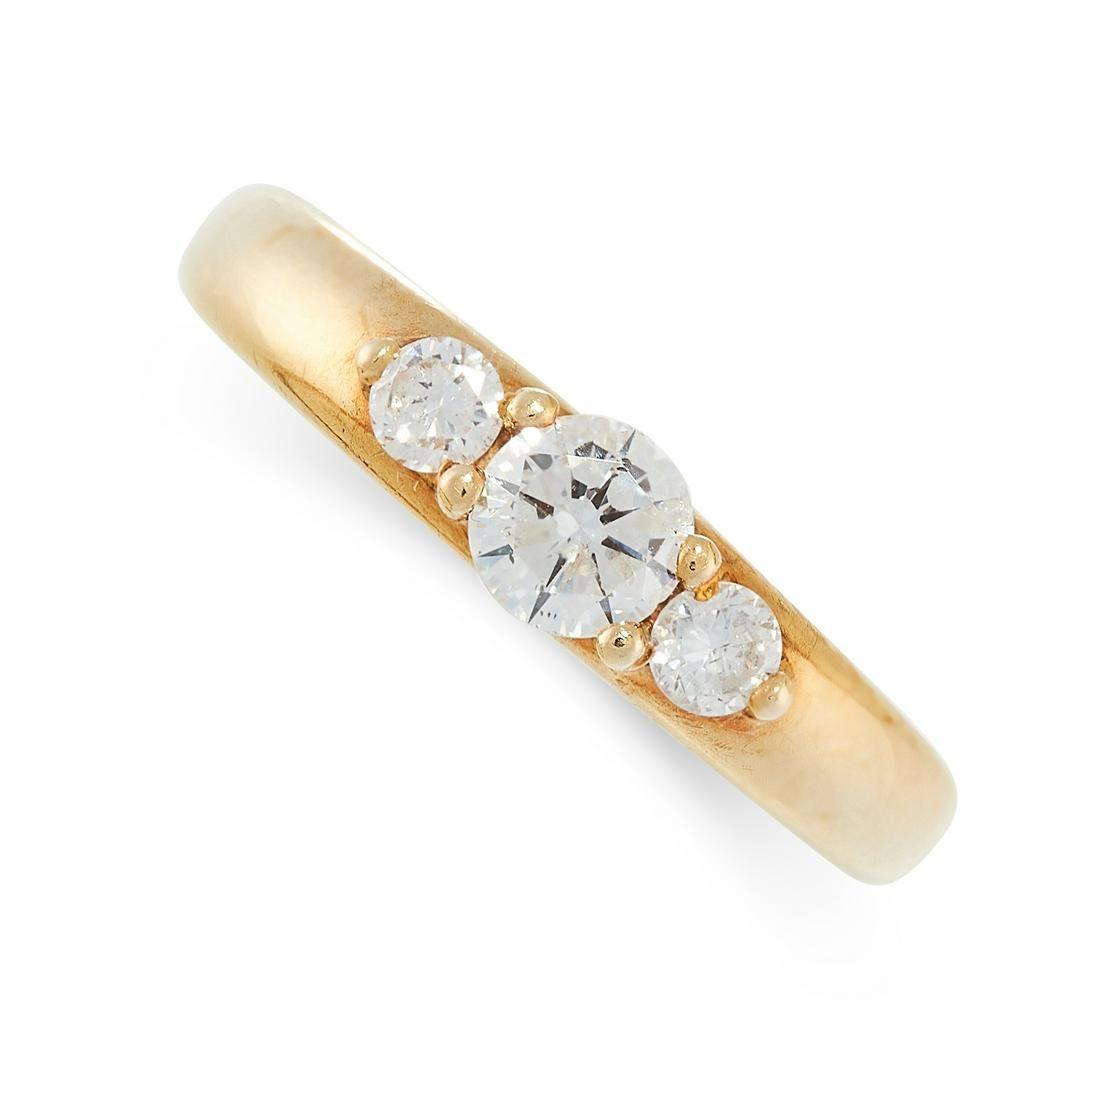 A DIAMOND THREE STONE RING in 18ct yellow gold, set